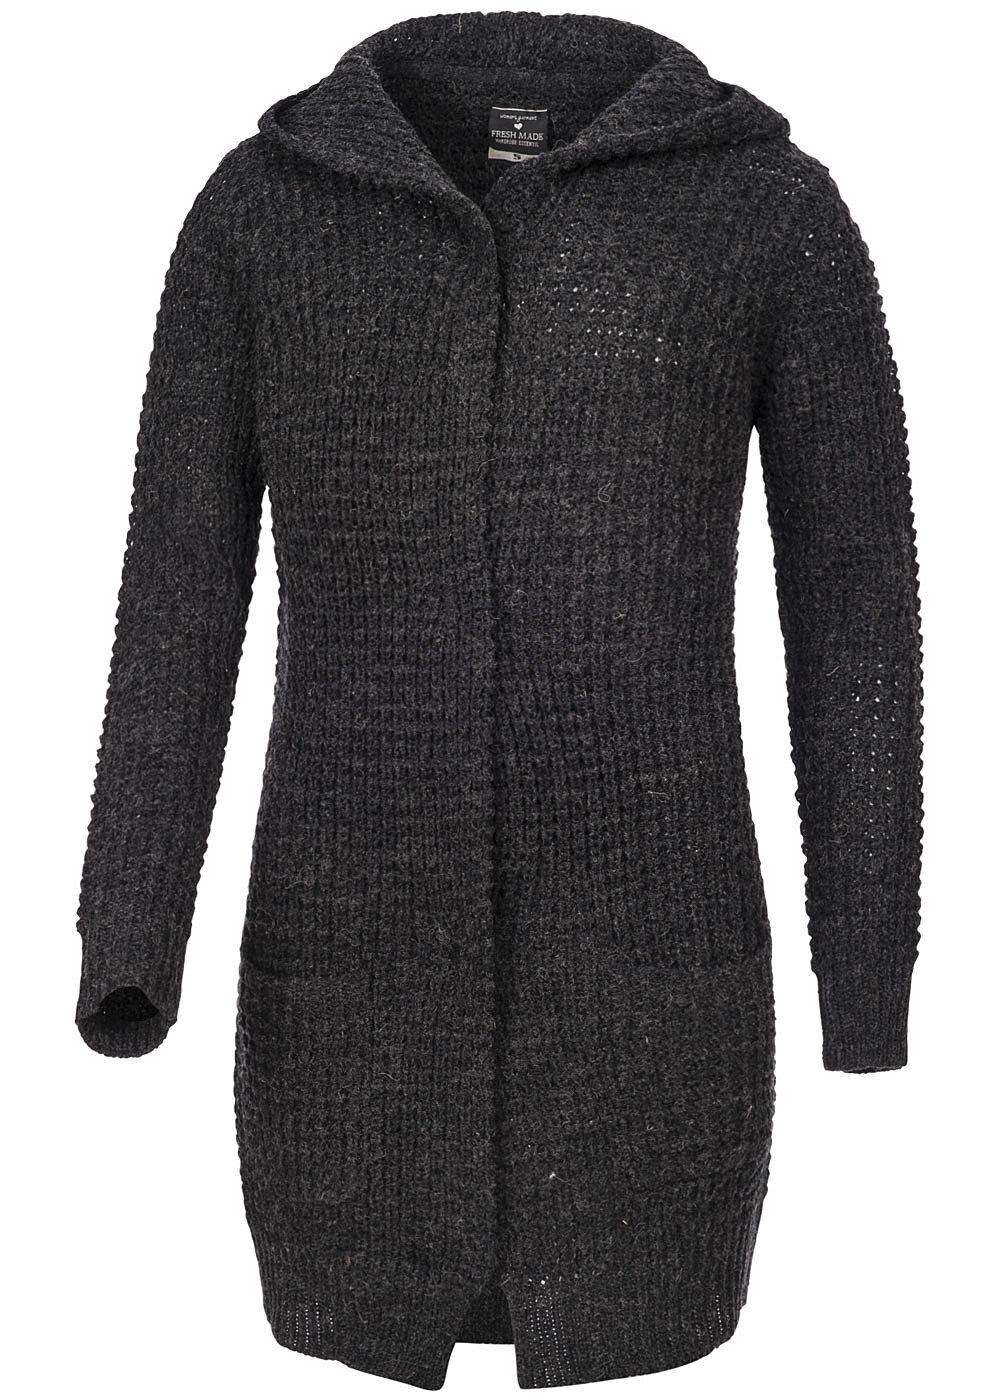 eight2nine damen longform cardigan mit kapuze 2 taschen by fresh made. Black Bedroom Furniture Sets. Home Design Ideas